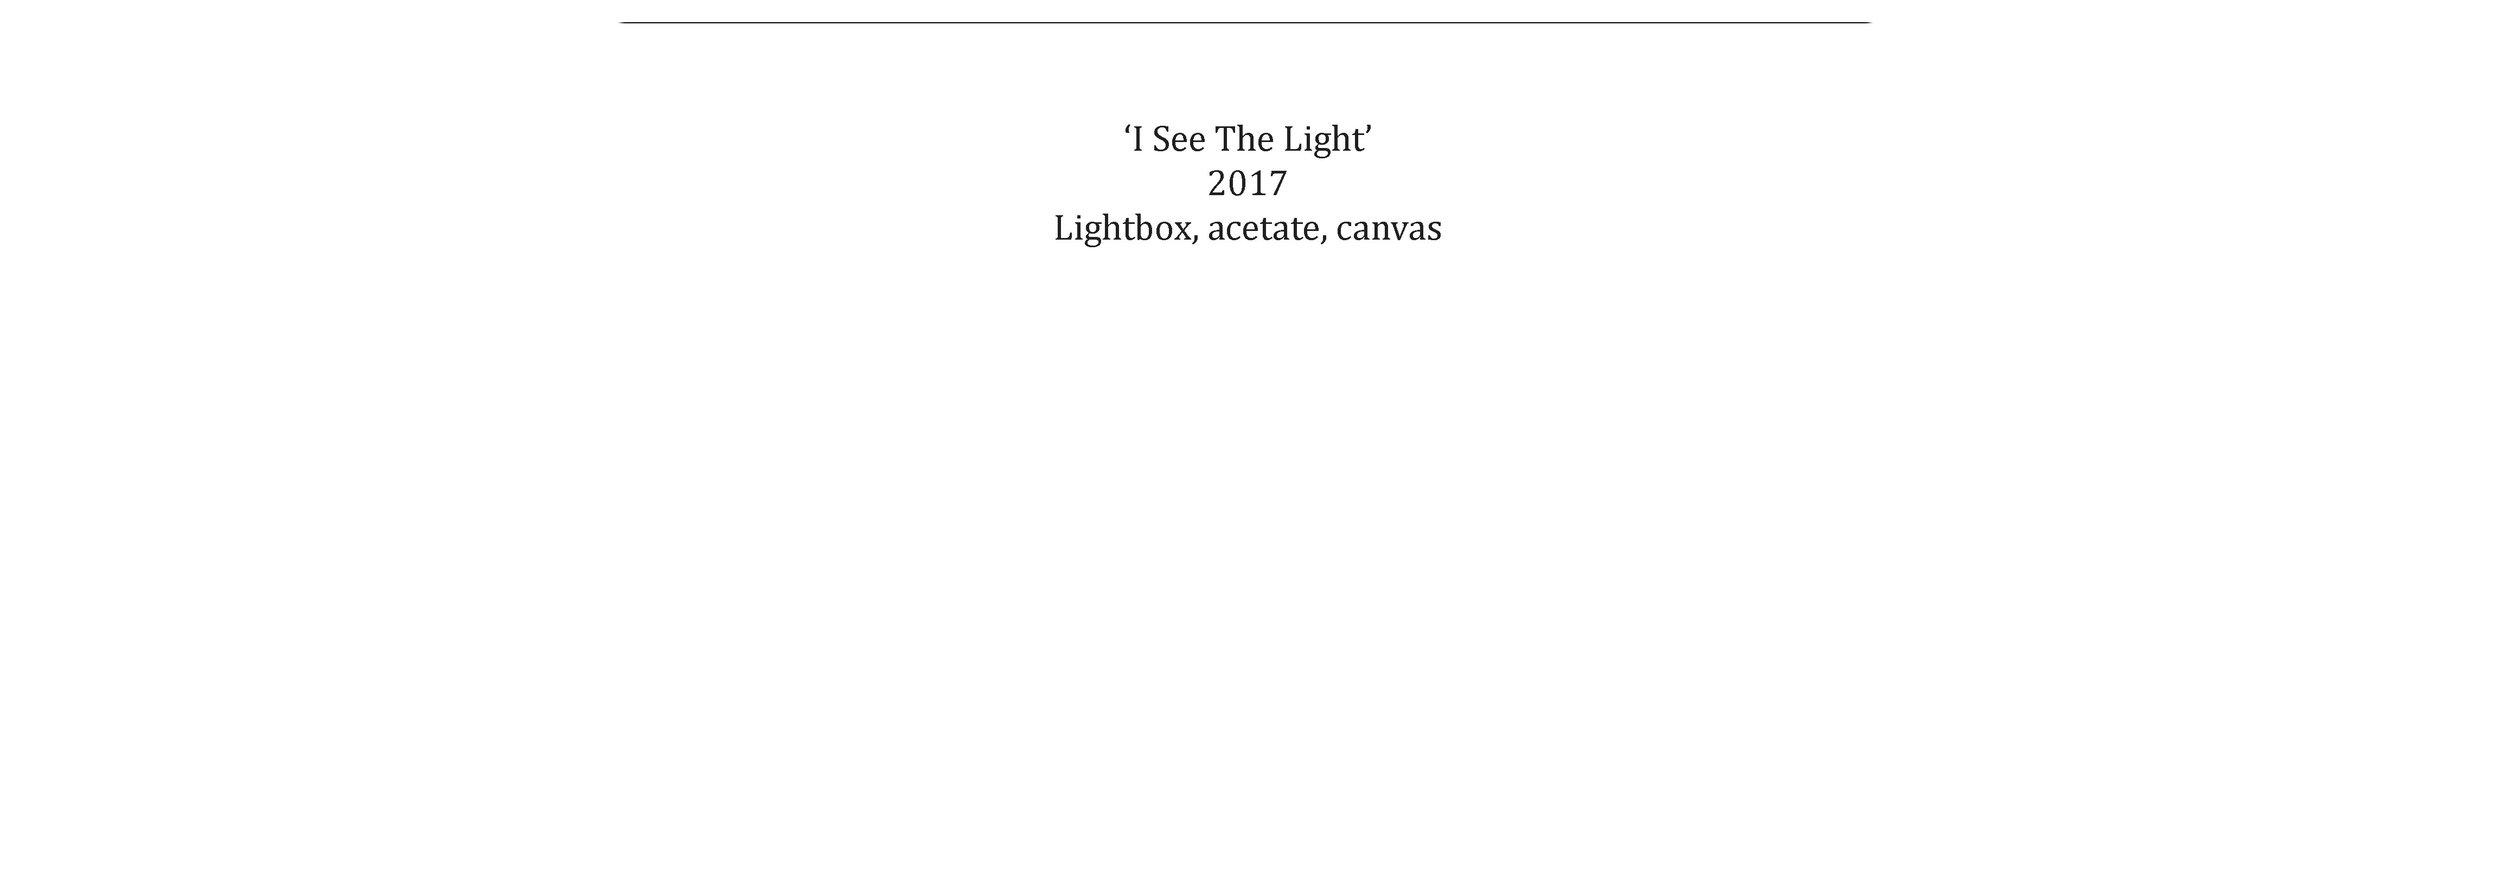 I see lights.jpg